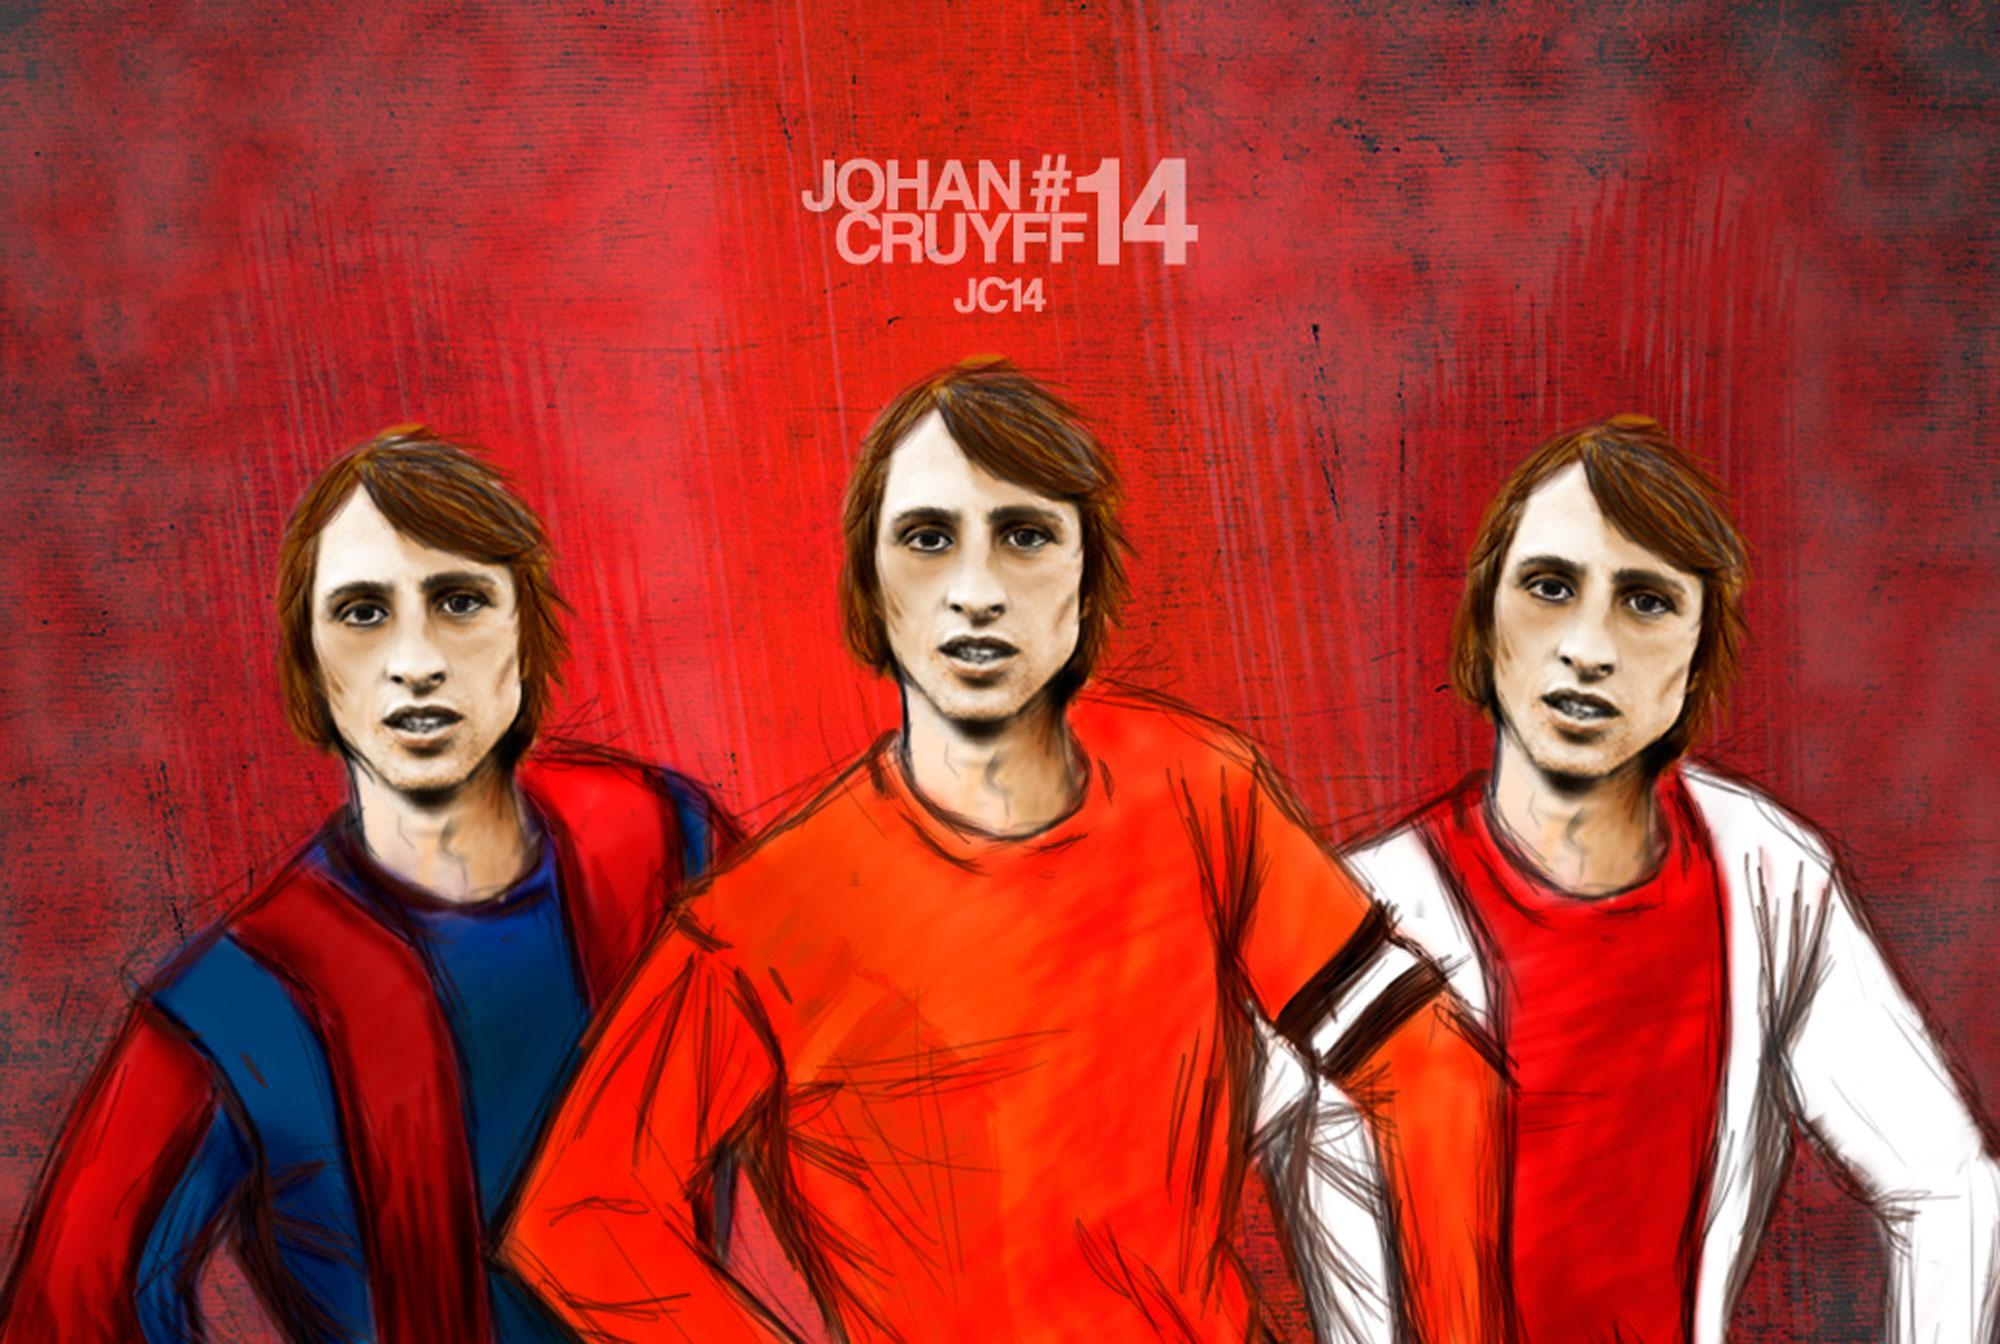 finalcruyff